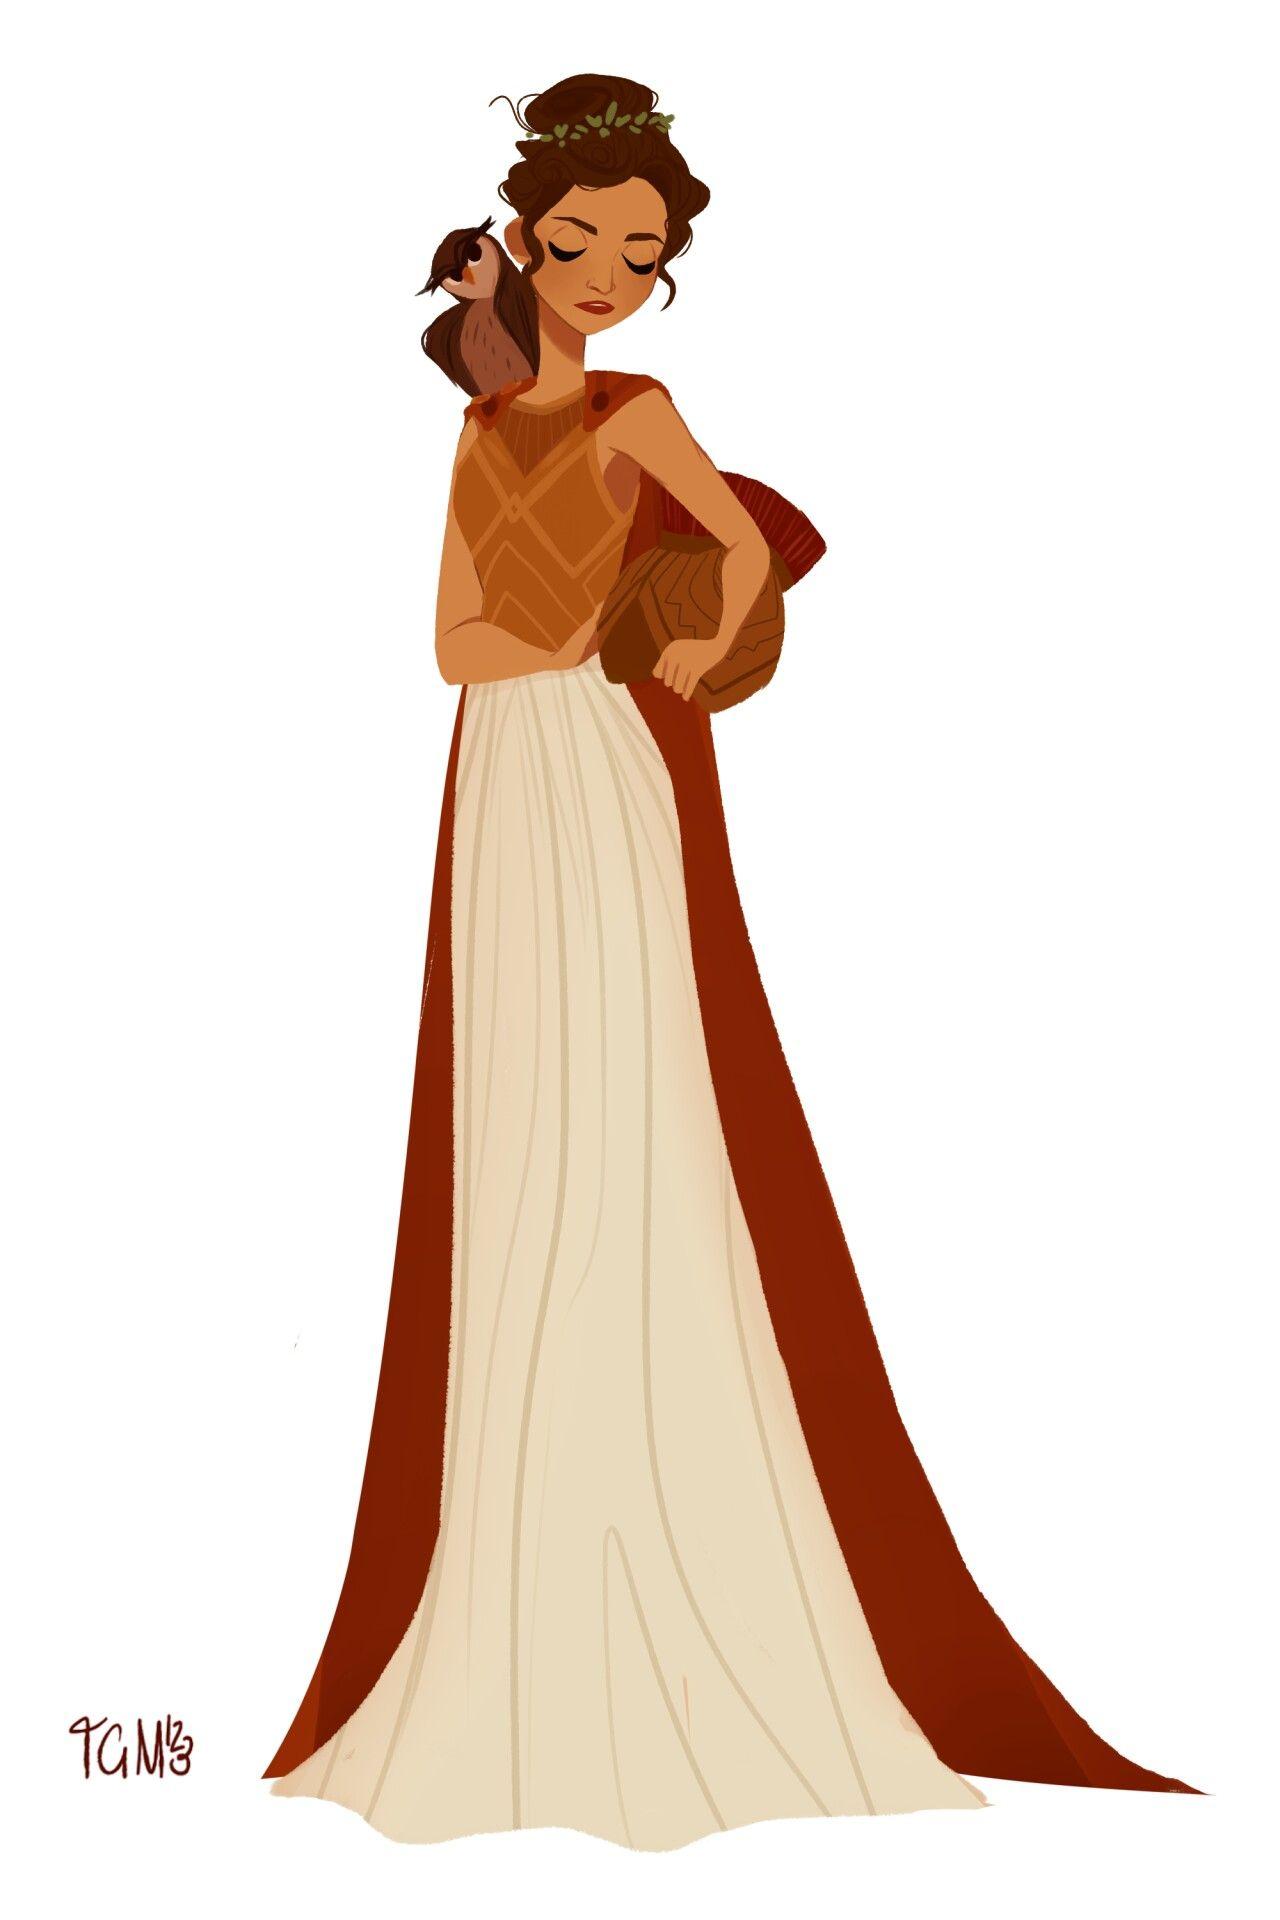 Pin By Walaa Hassan On Cartoon Character Design Character